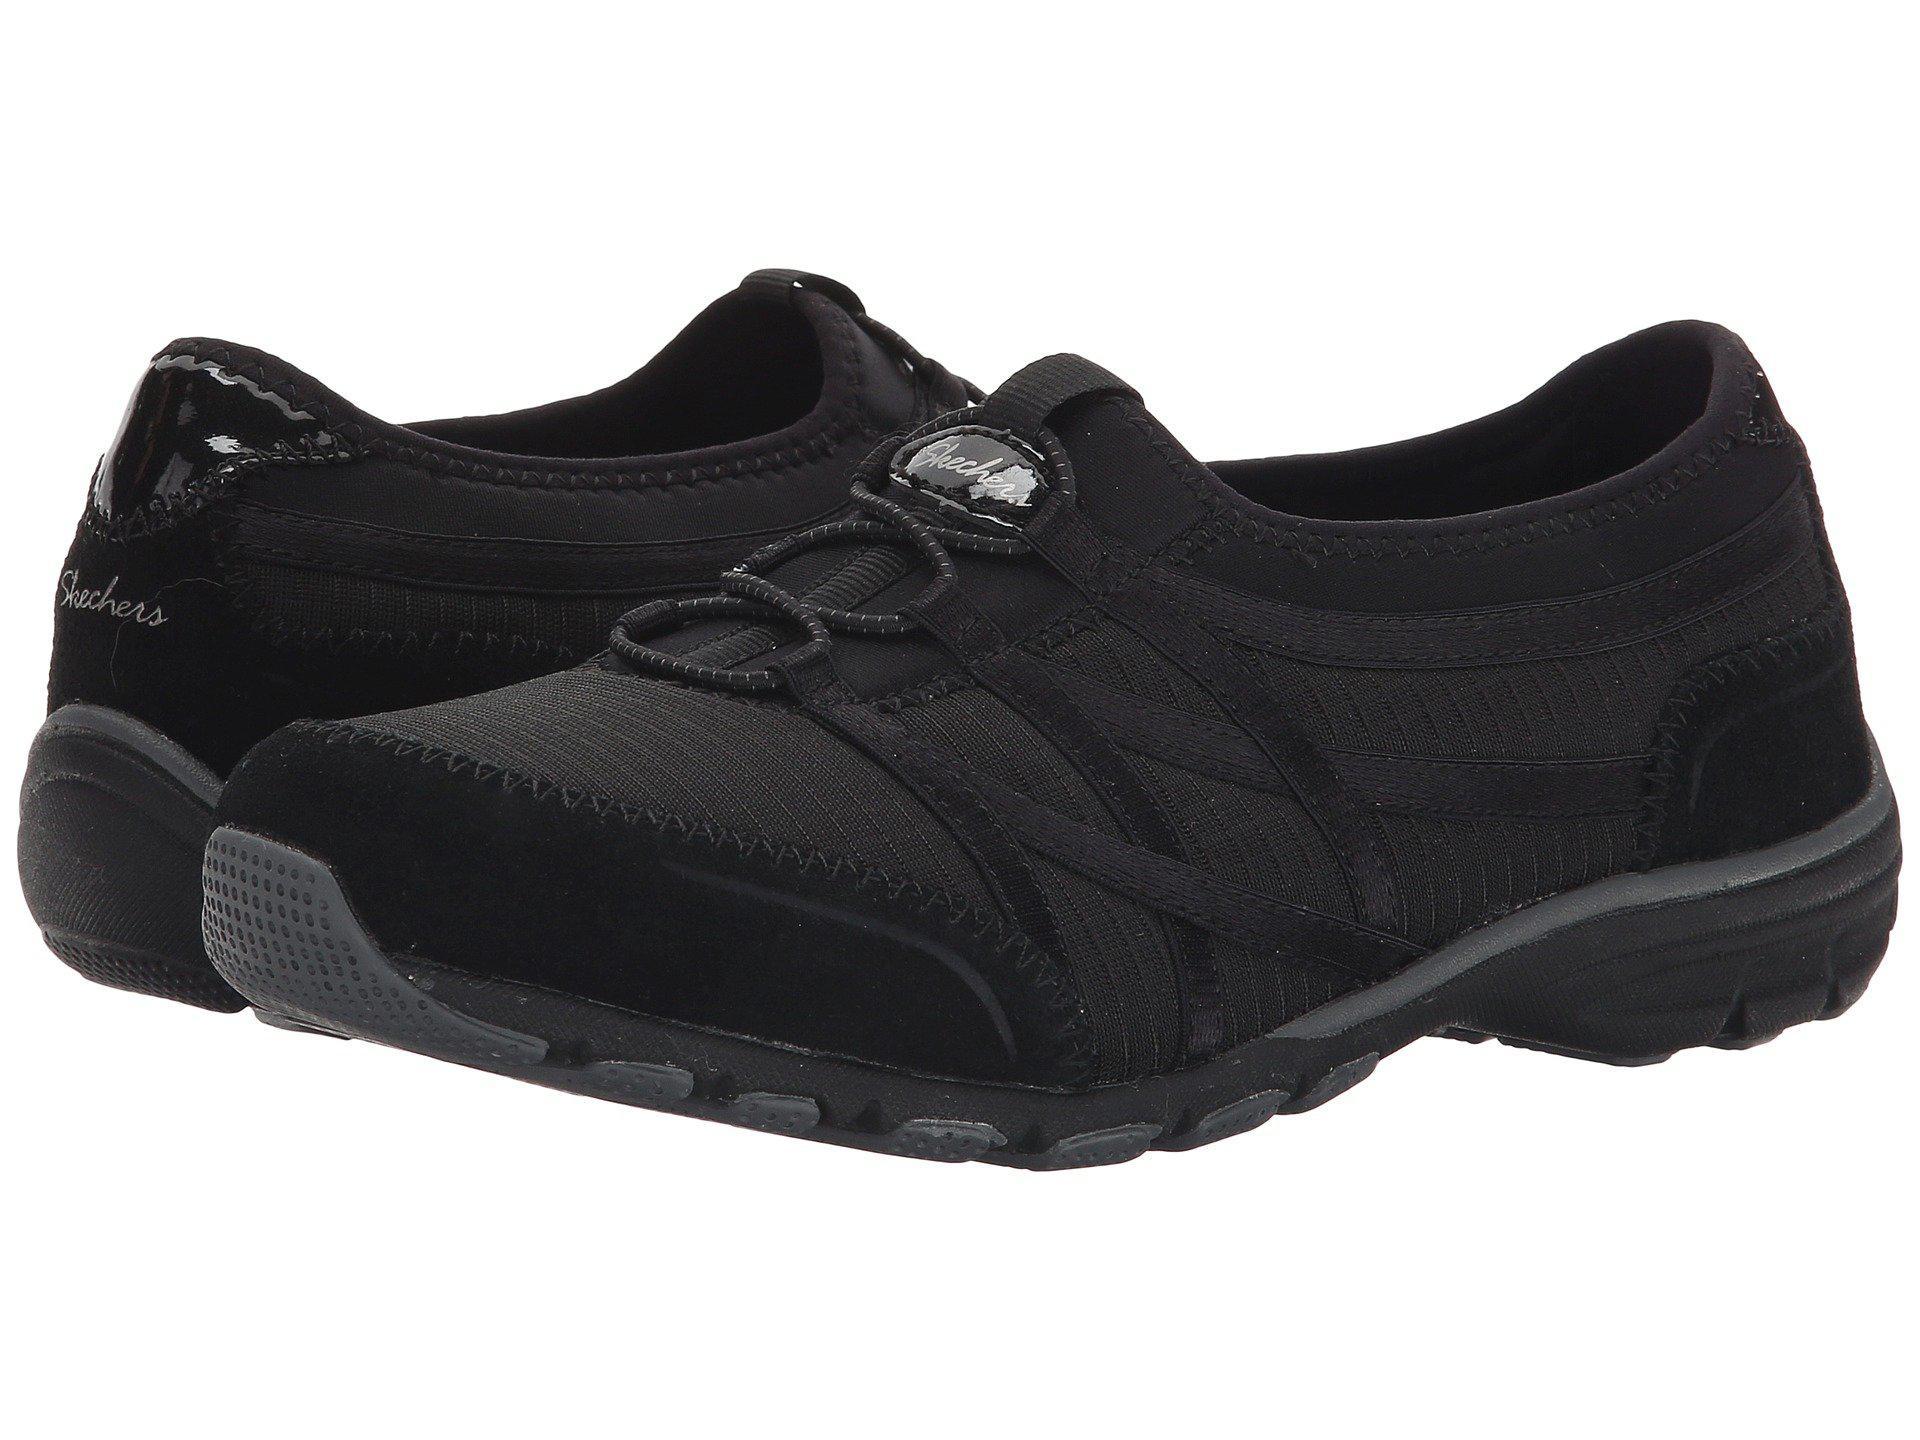 954669990730 Lyst - Skechers Conversations - Charming in Black